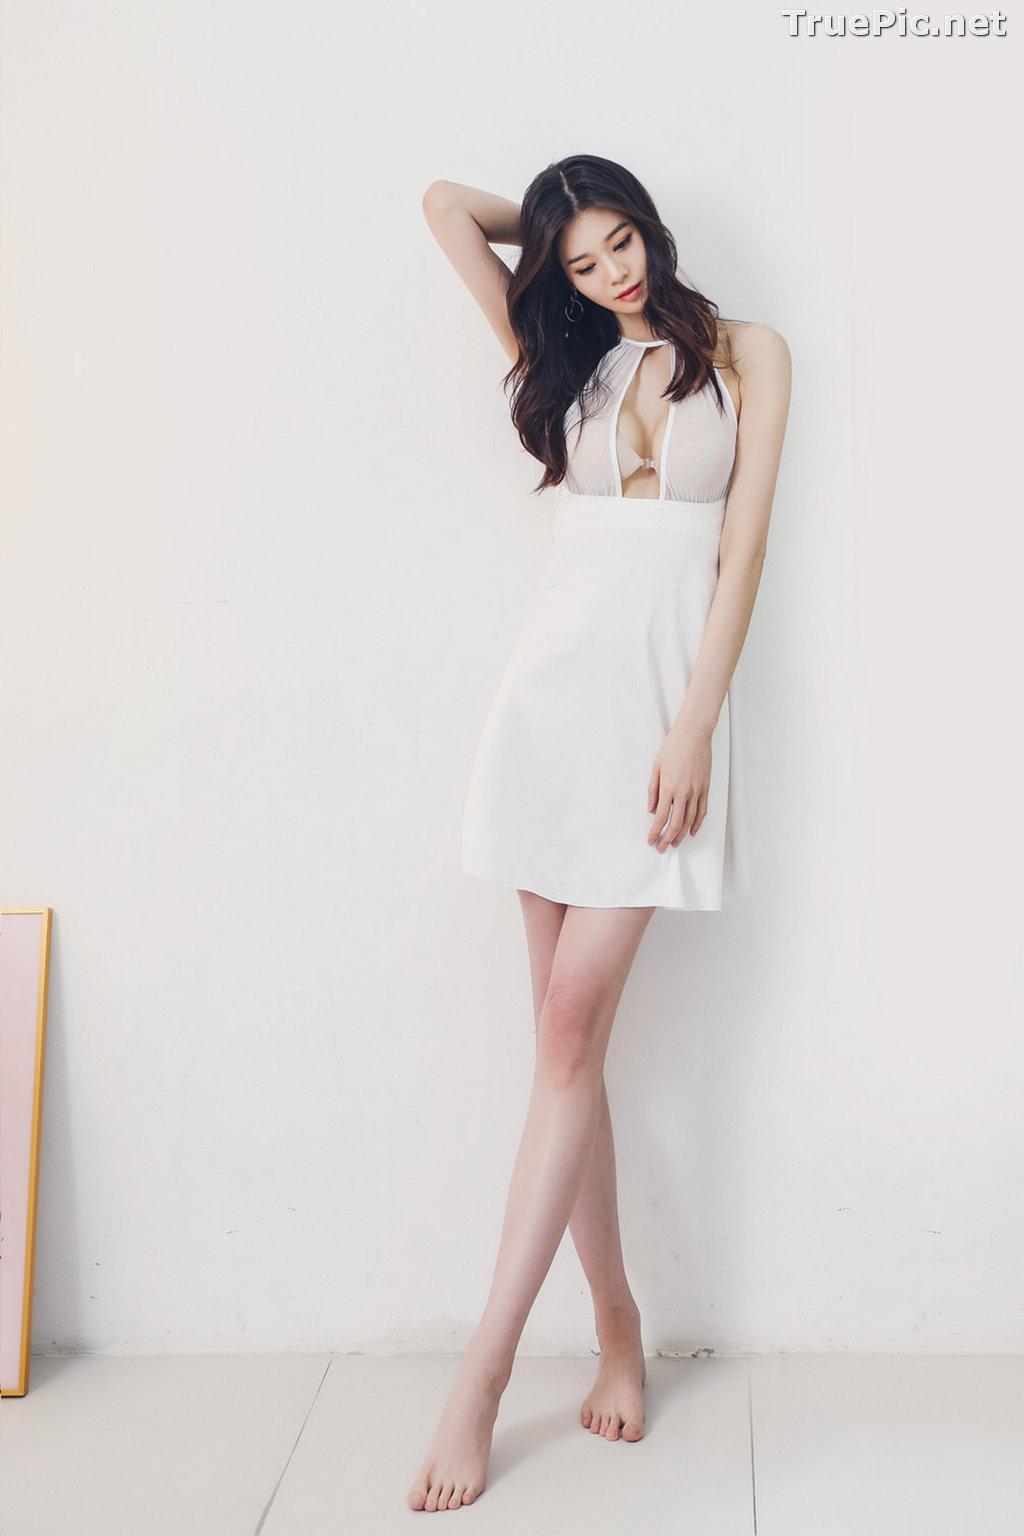 Image Korean Fashion Model - Carmen - White Sleepwear and Lingerie - TruePic.net - Picture-7